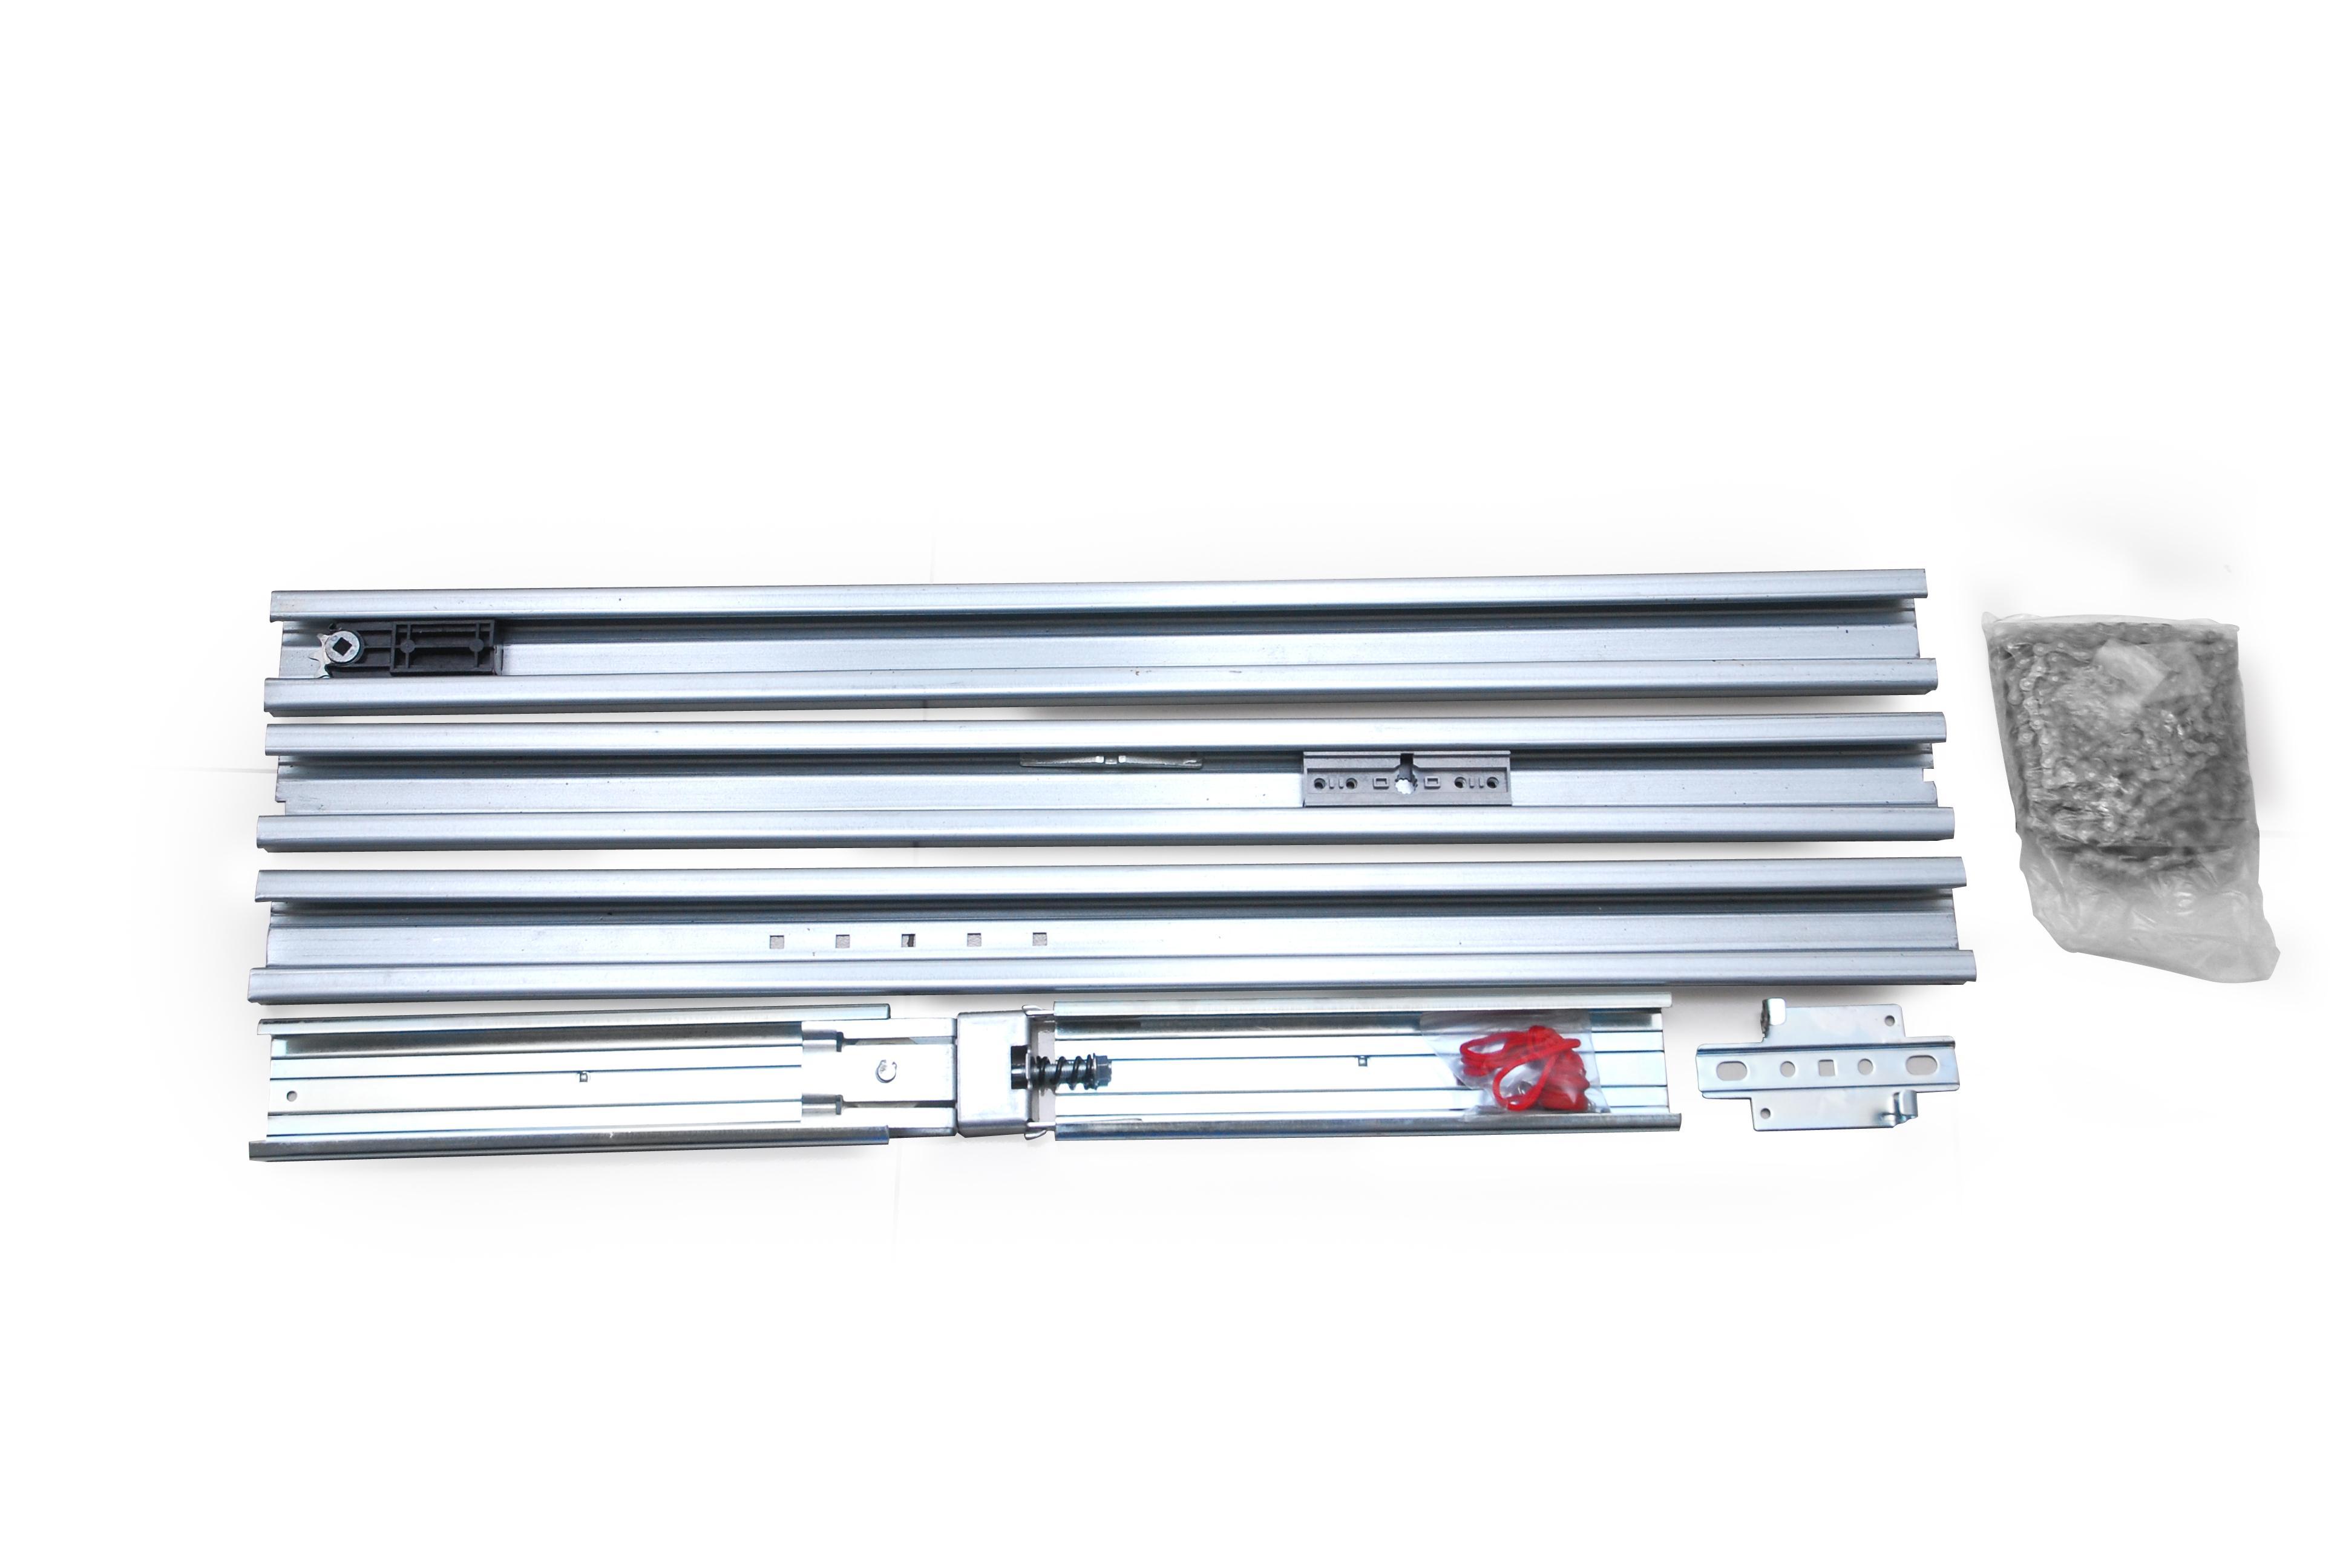 3 part Rail (Iron or Alu. Rail)